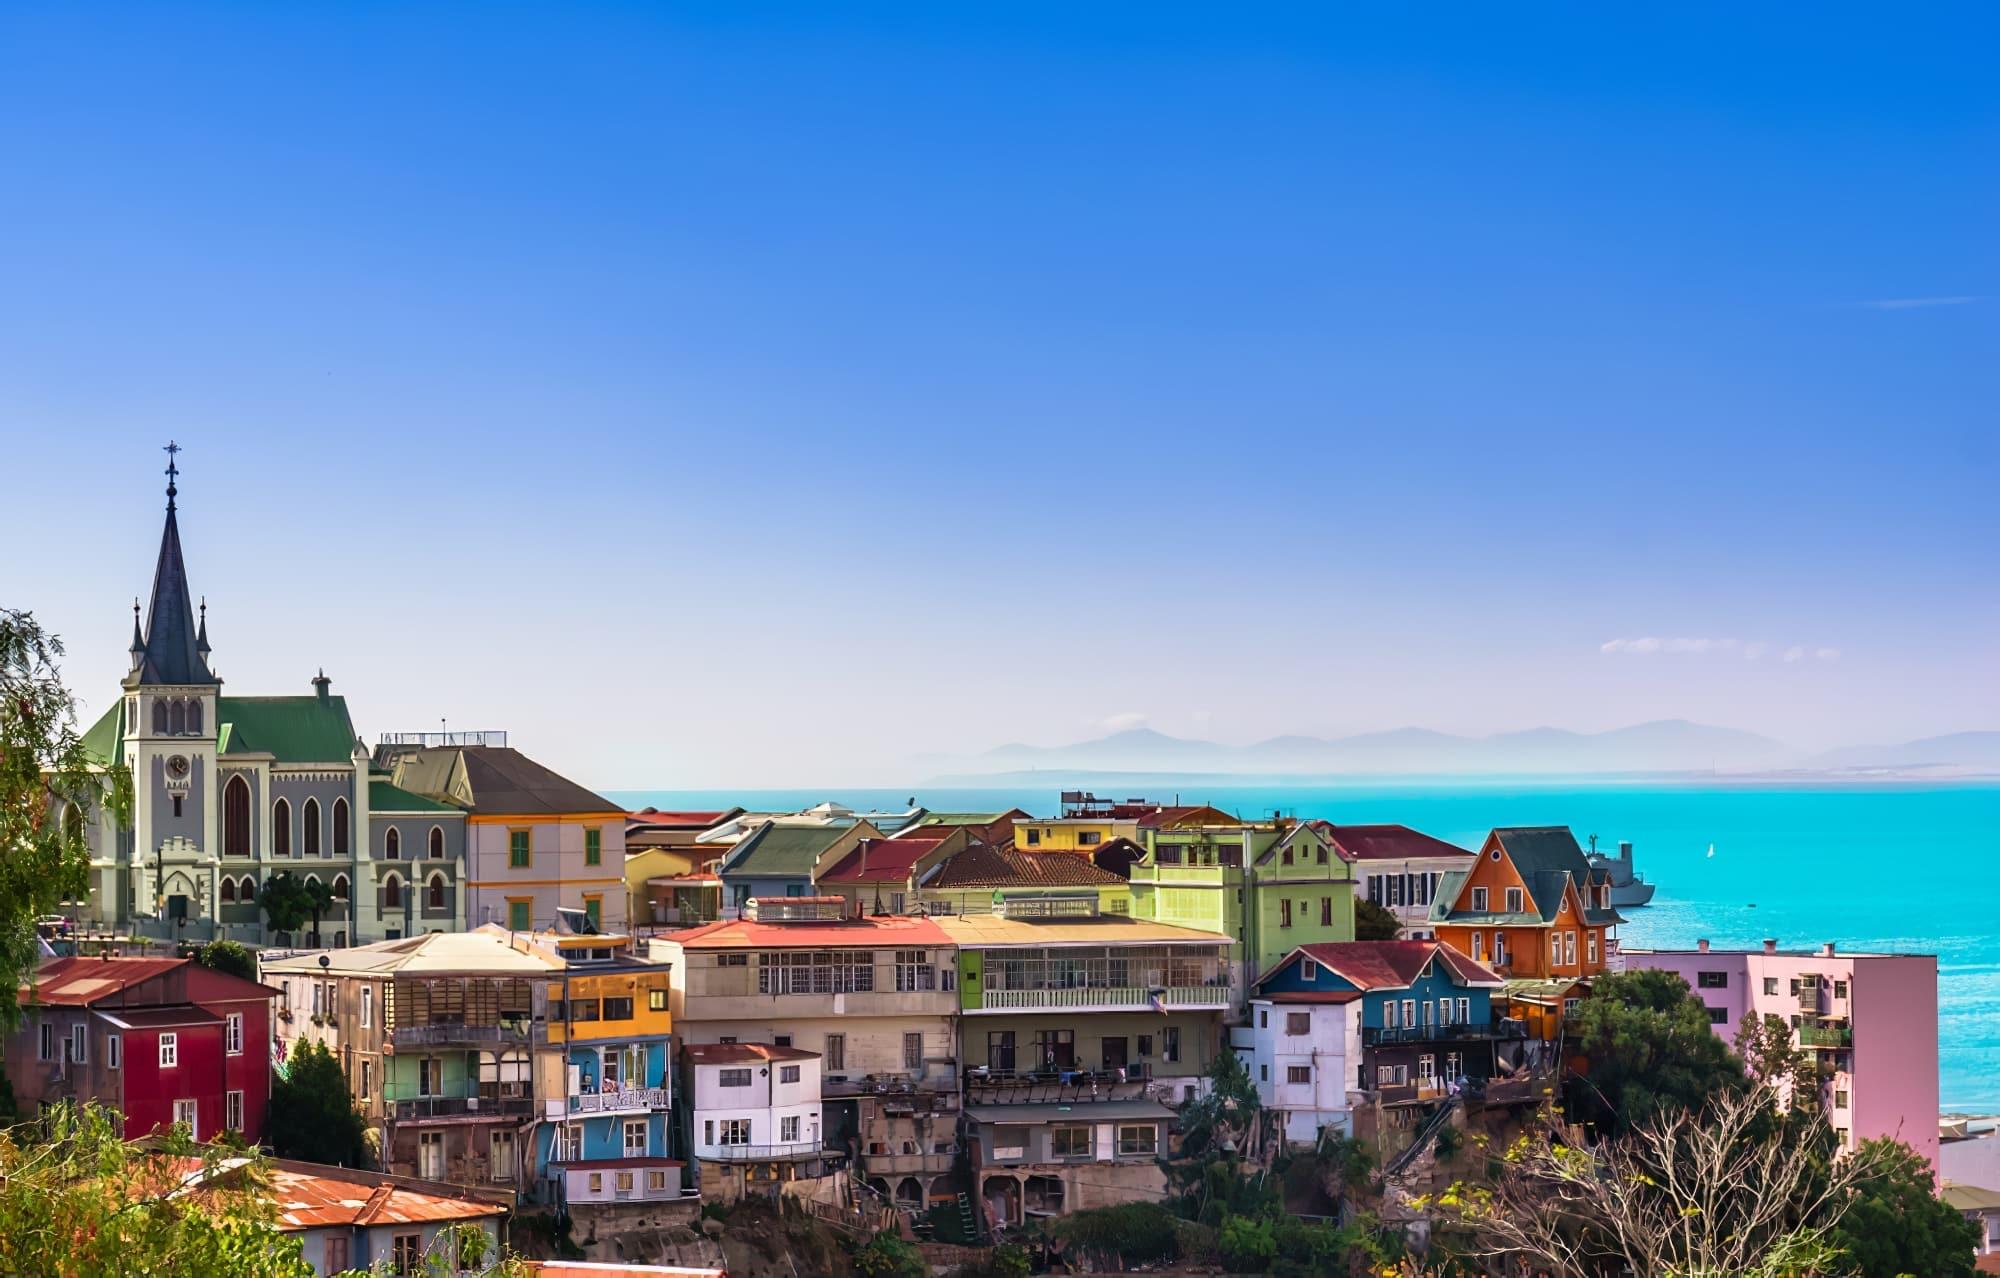 Loger à Valparaiso